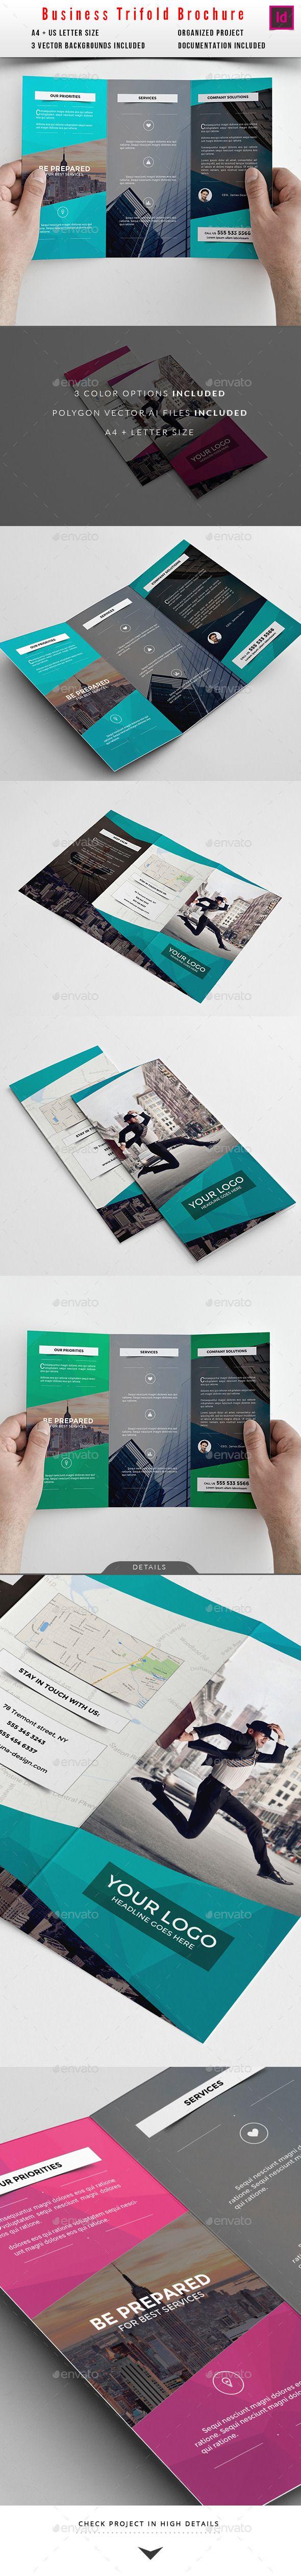 Business Trifold Brochure Template #design Download: http://graphicriver.net/item/business-trifold-brochure/10413512?ref=ksioks